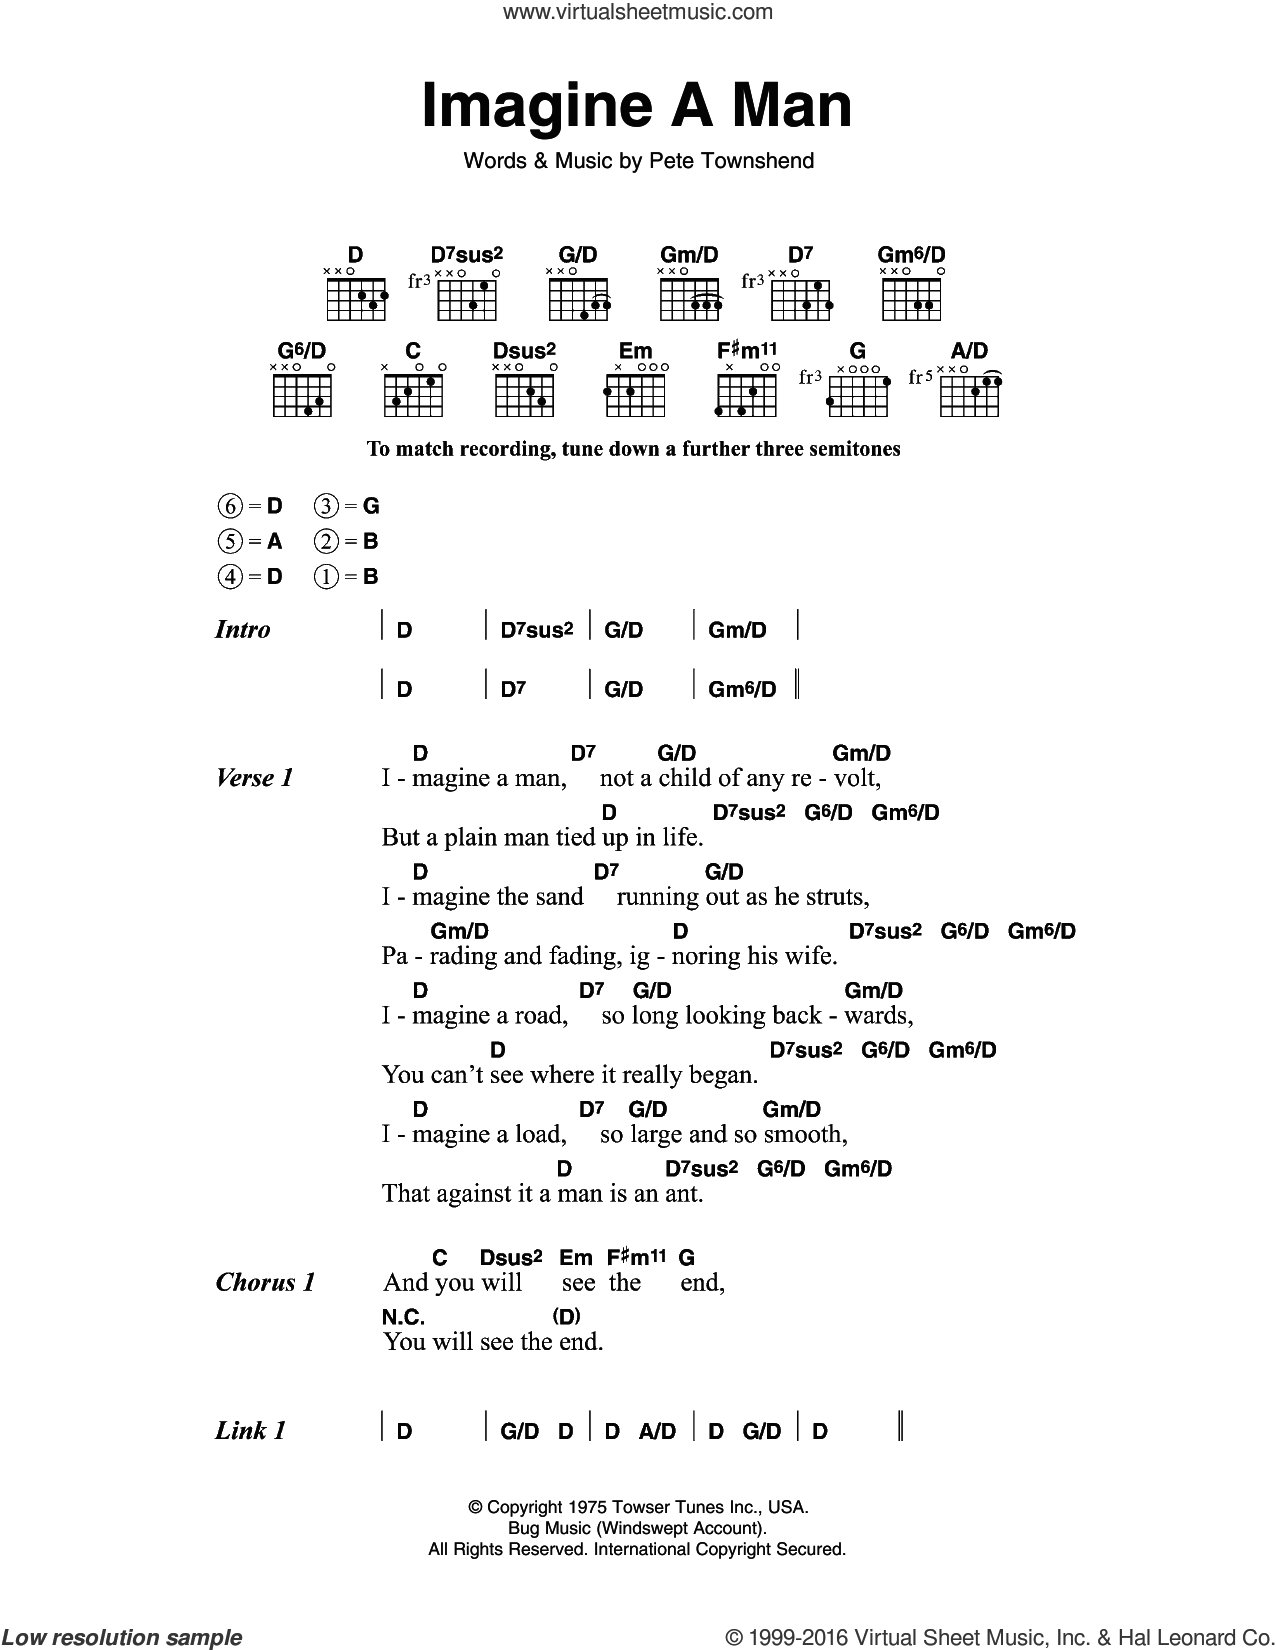 Imagine guitar chords images guitar chords examples guitar chords to imagine image collections guitar chords examples who imagine a man sheet music for hexwebz Gallery